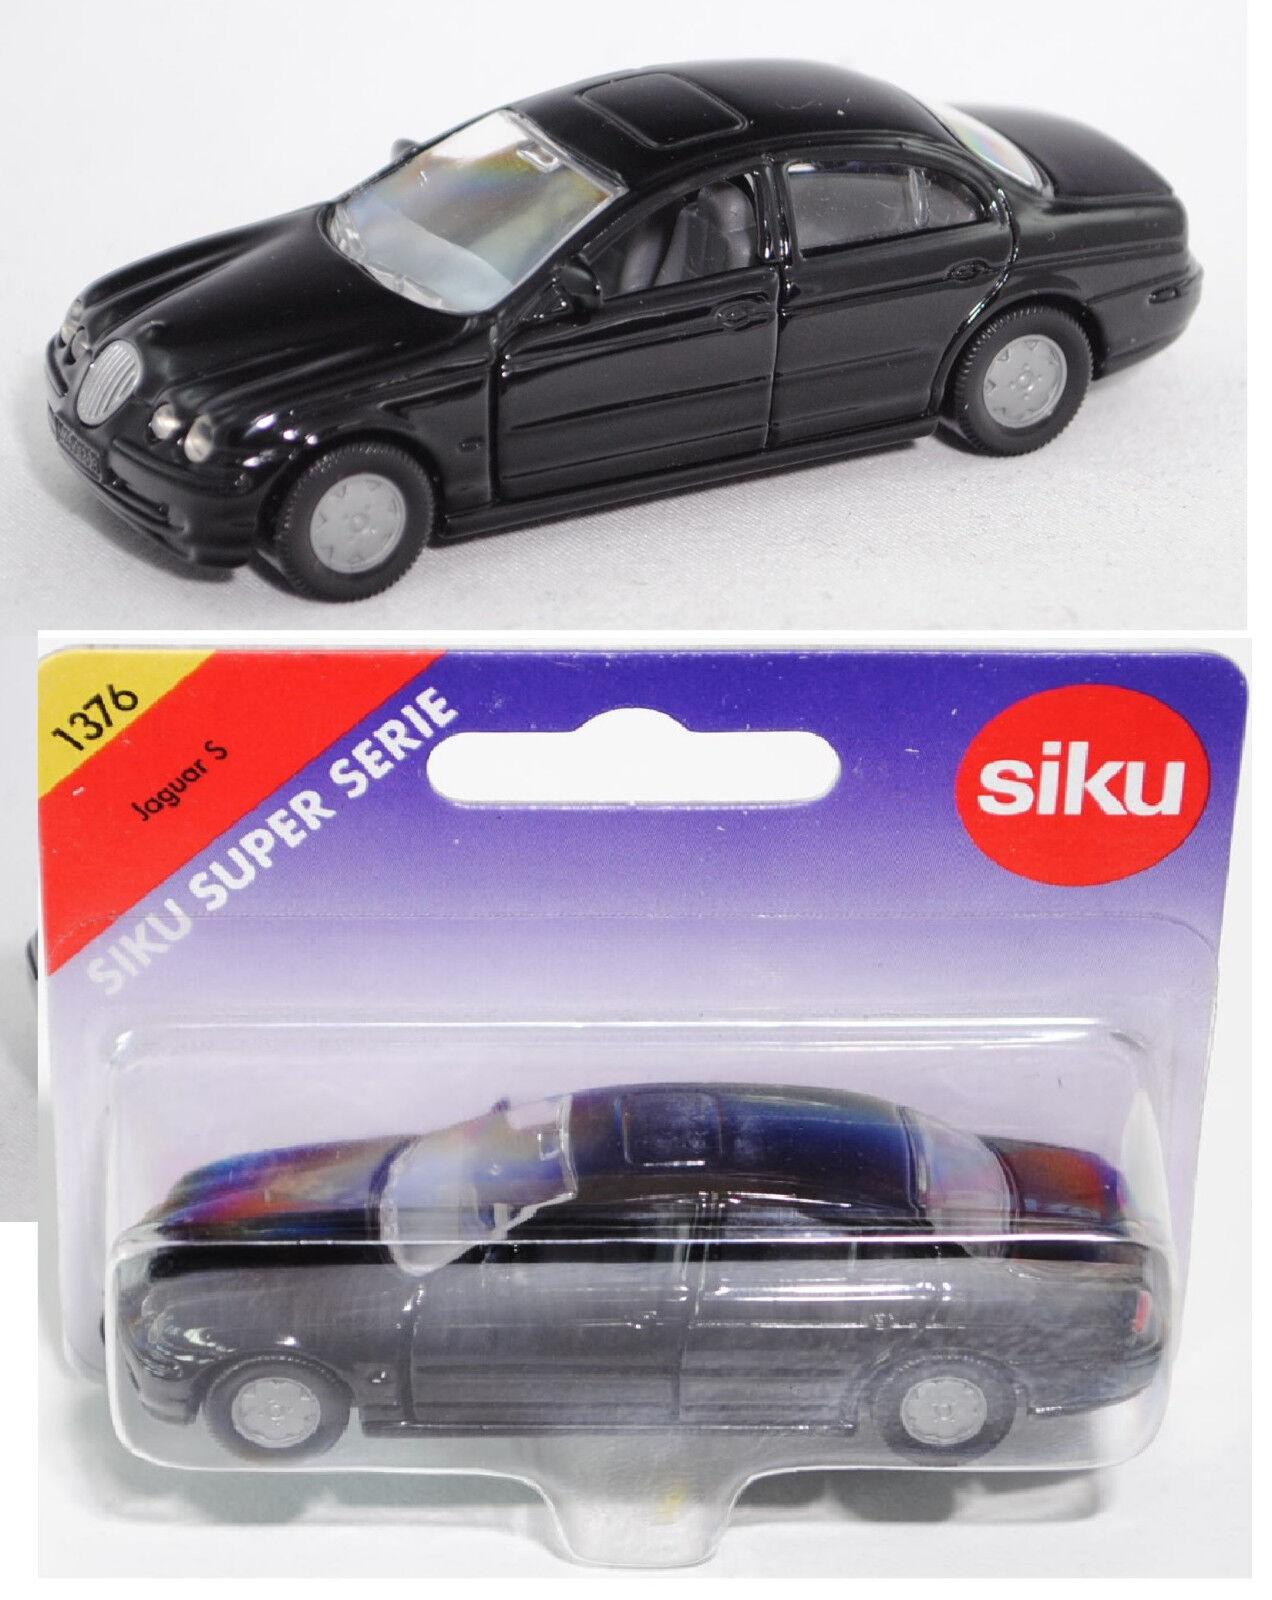 SIKU SUPER 1376 00402 JAGUAR  S 4.0 v8, noir, modèle spécial  grosses soldes